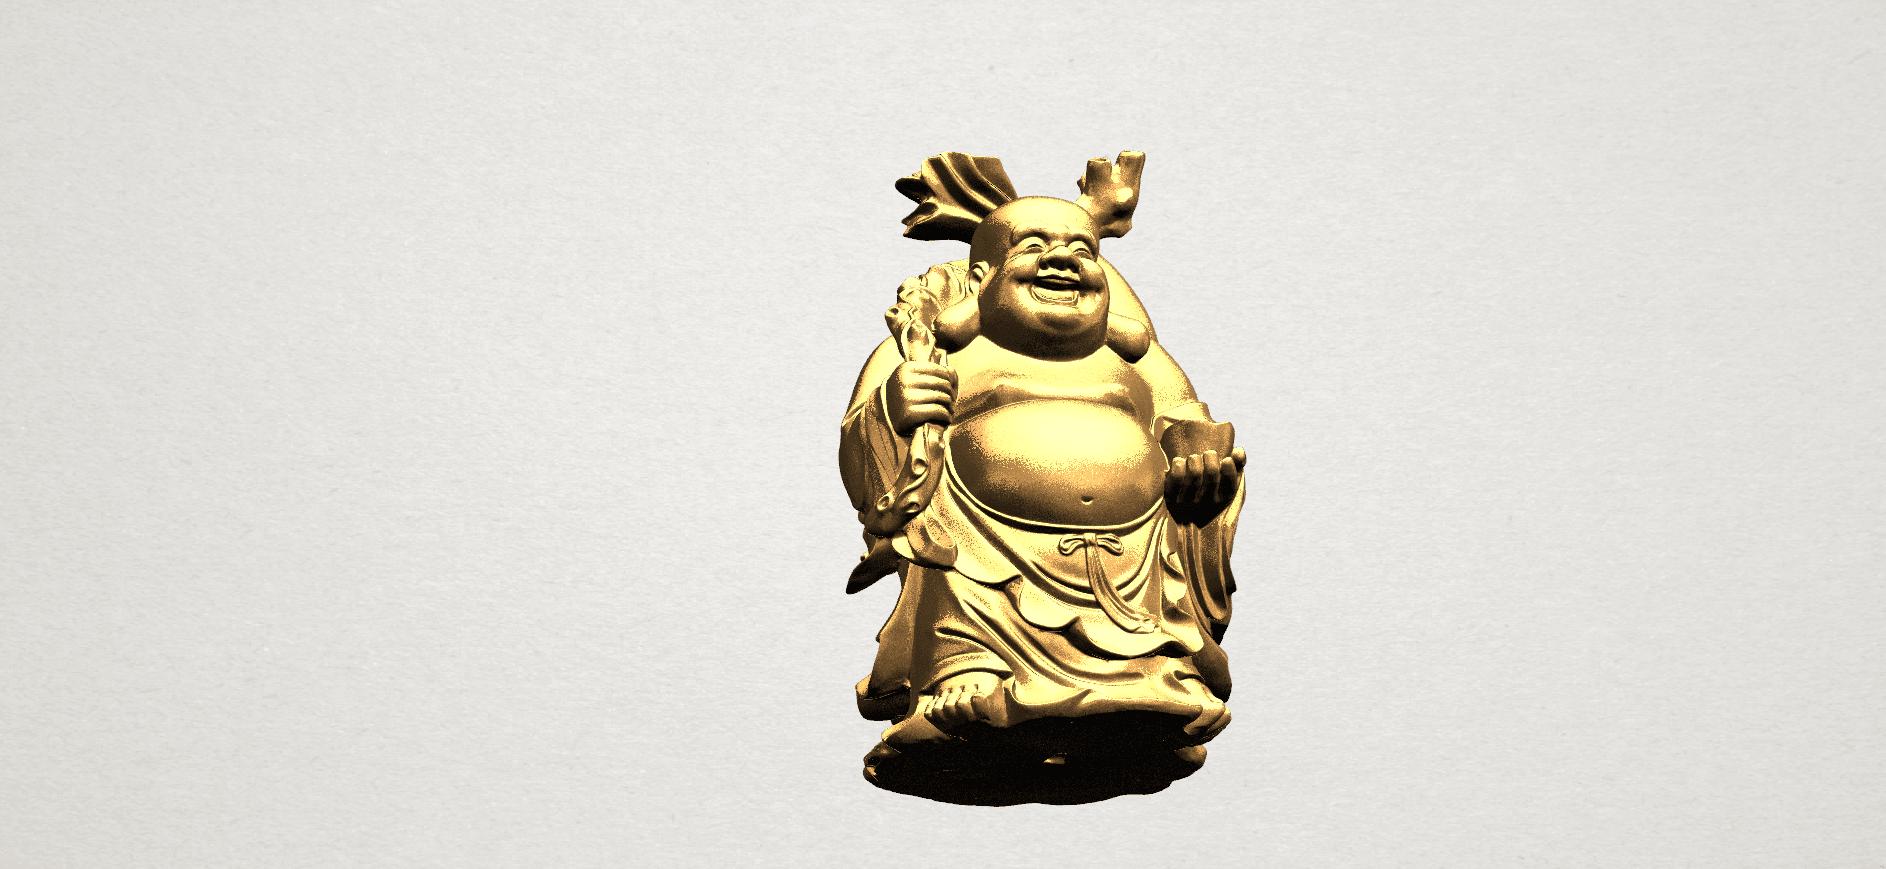 Metteyya Buddha 05 - 88mm - A10.png Télécharger fichier STL gratuit Bouddha Metteyya 05 • Objet imprimable en 3D, GeorgesNikkei